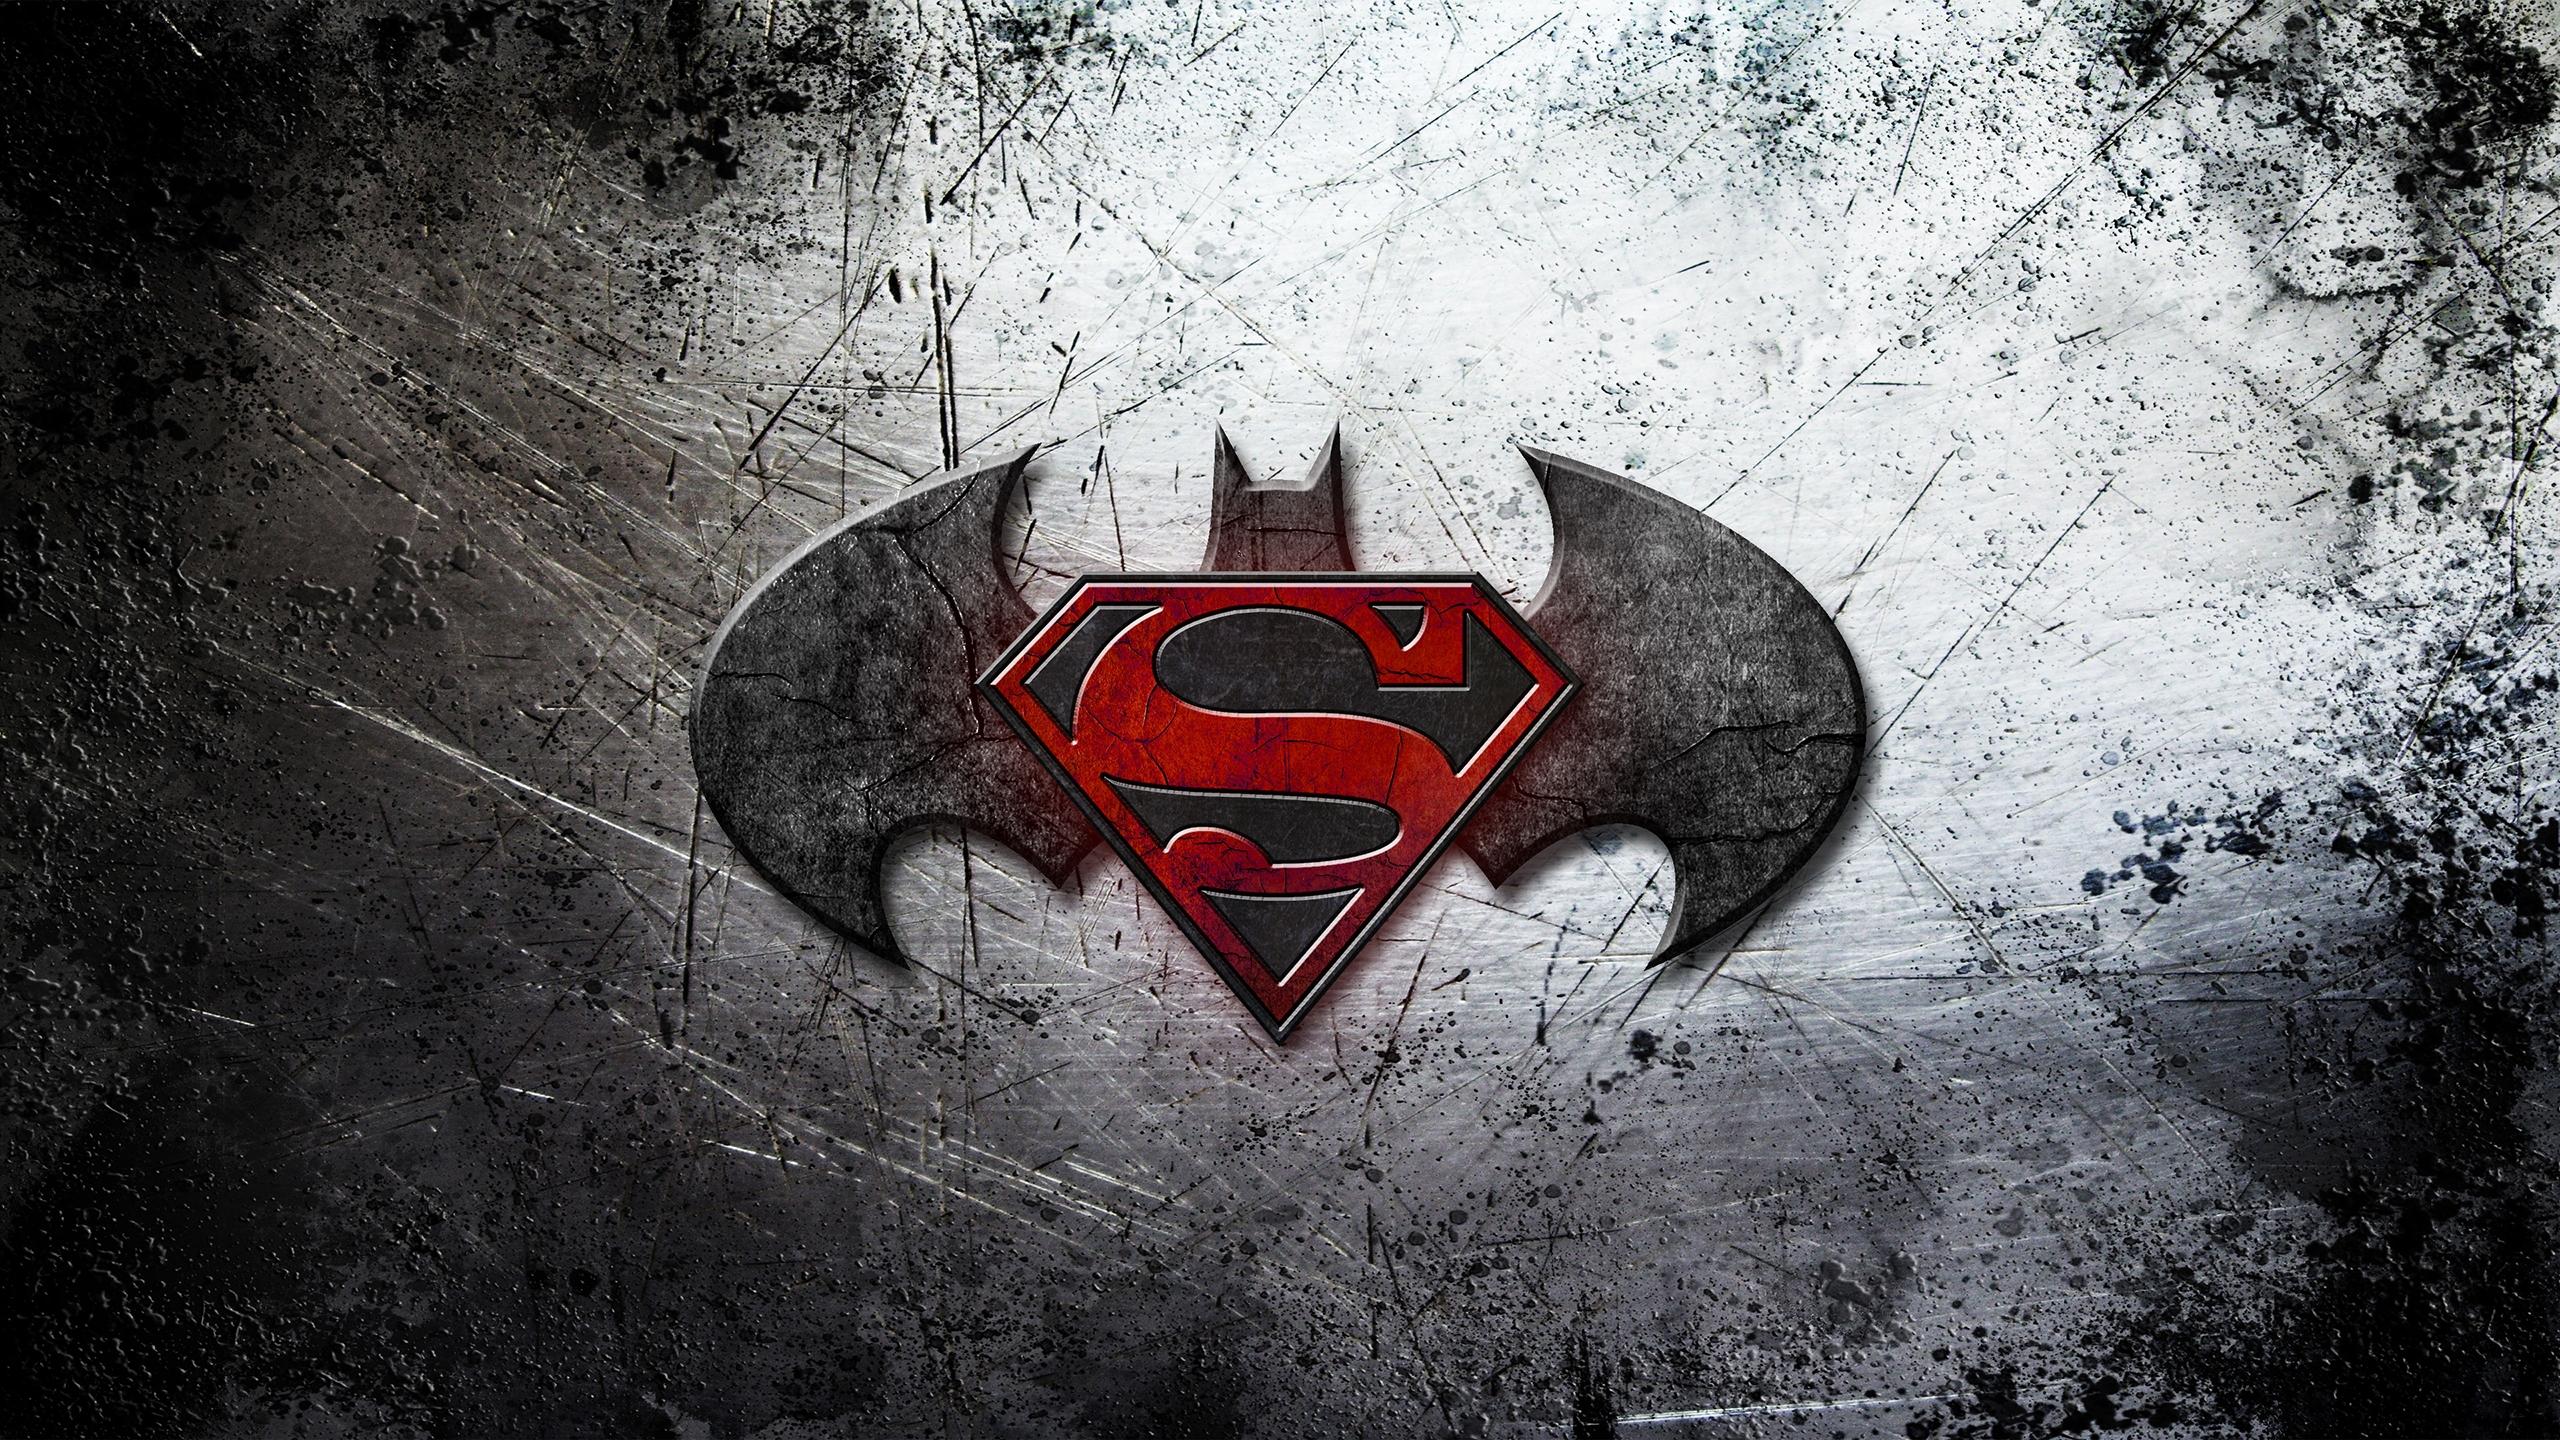 Batman vs Superman Logo Wallpaper in High Resolution at Movies 2560x1440